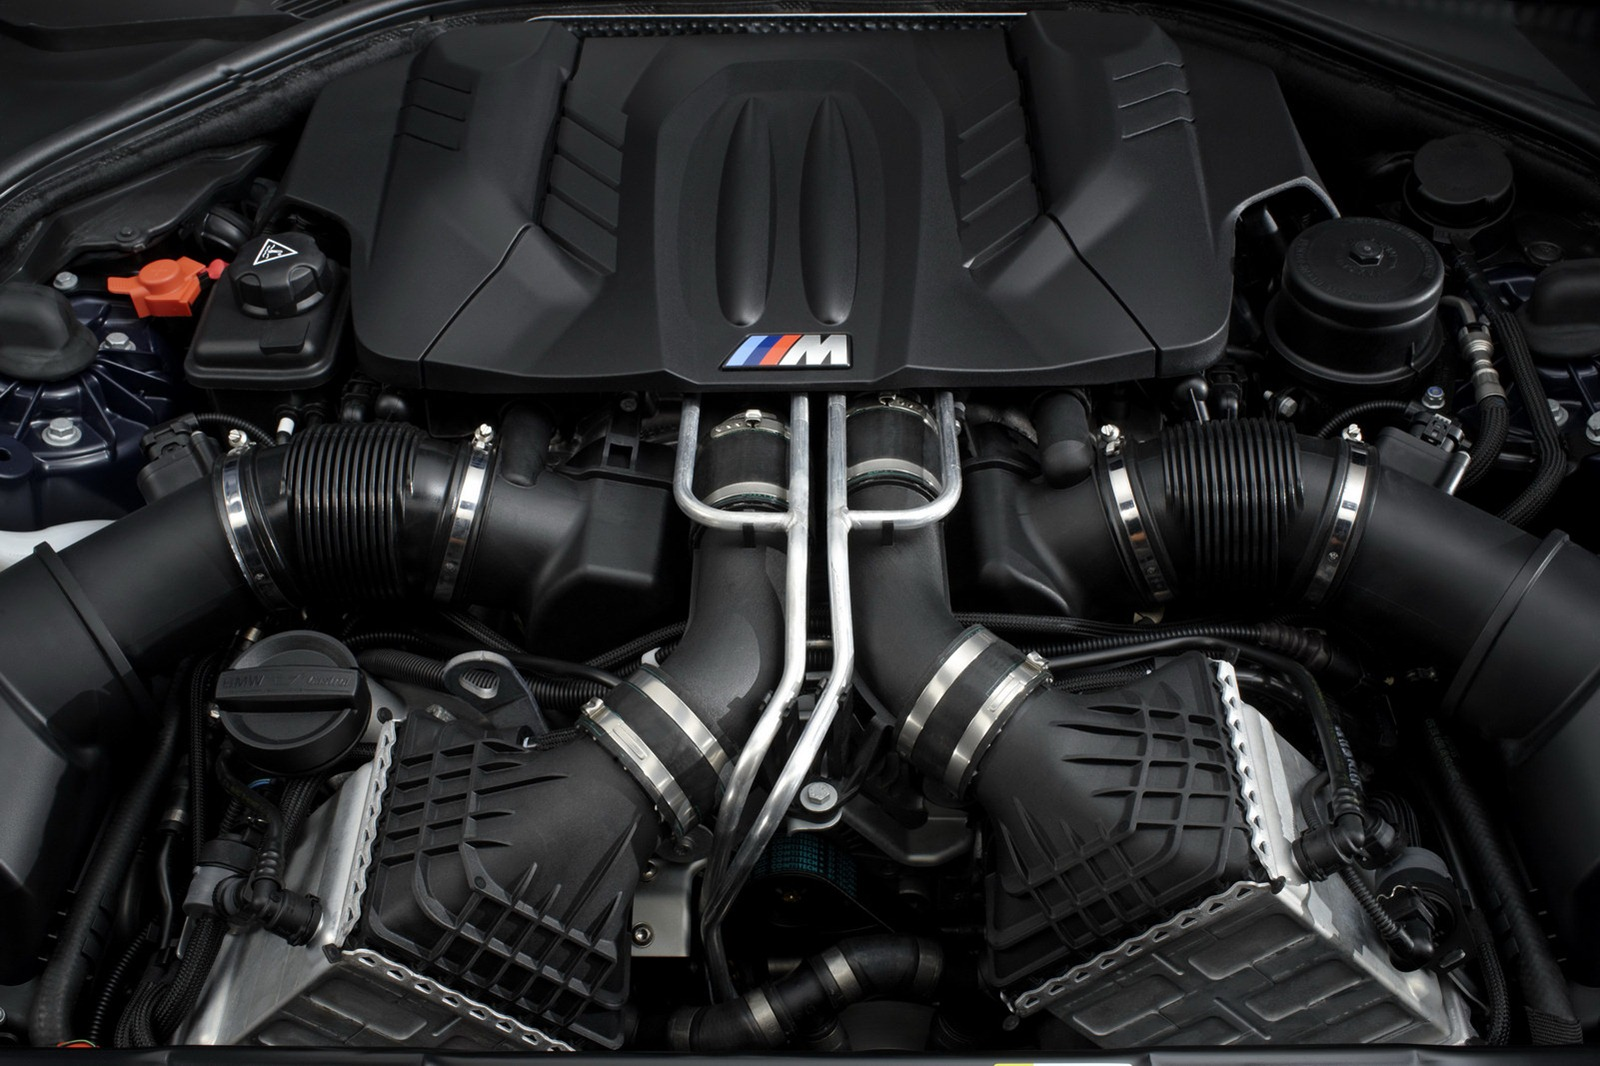 BMW M6 F12 Coupe 2012 engine closeup